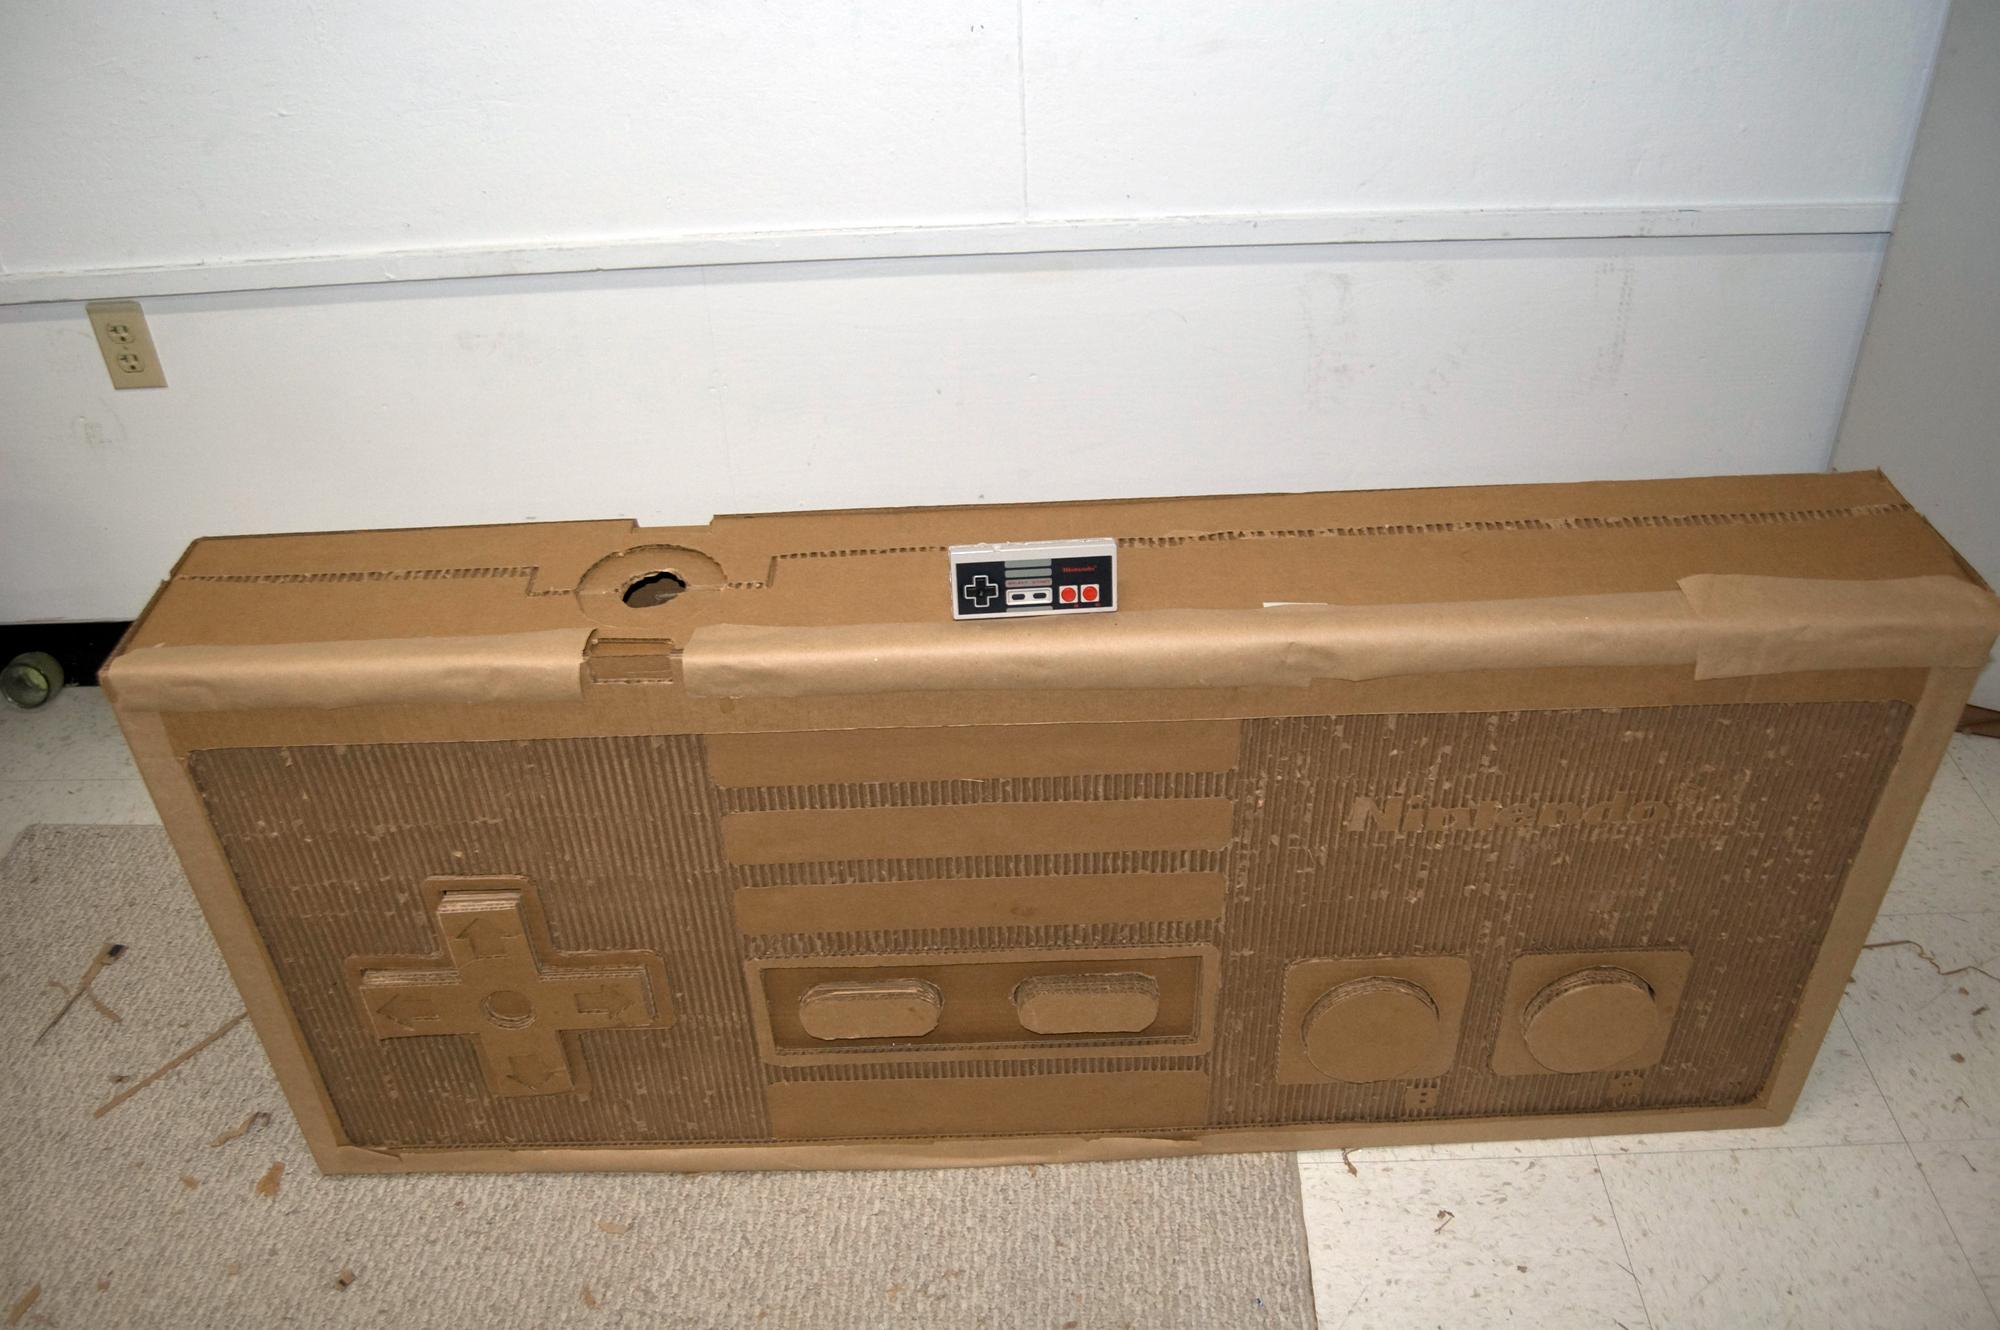 Cardboard NES Controller